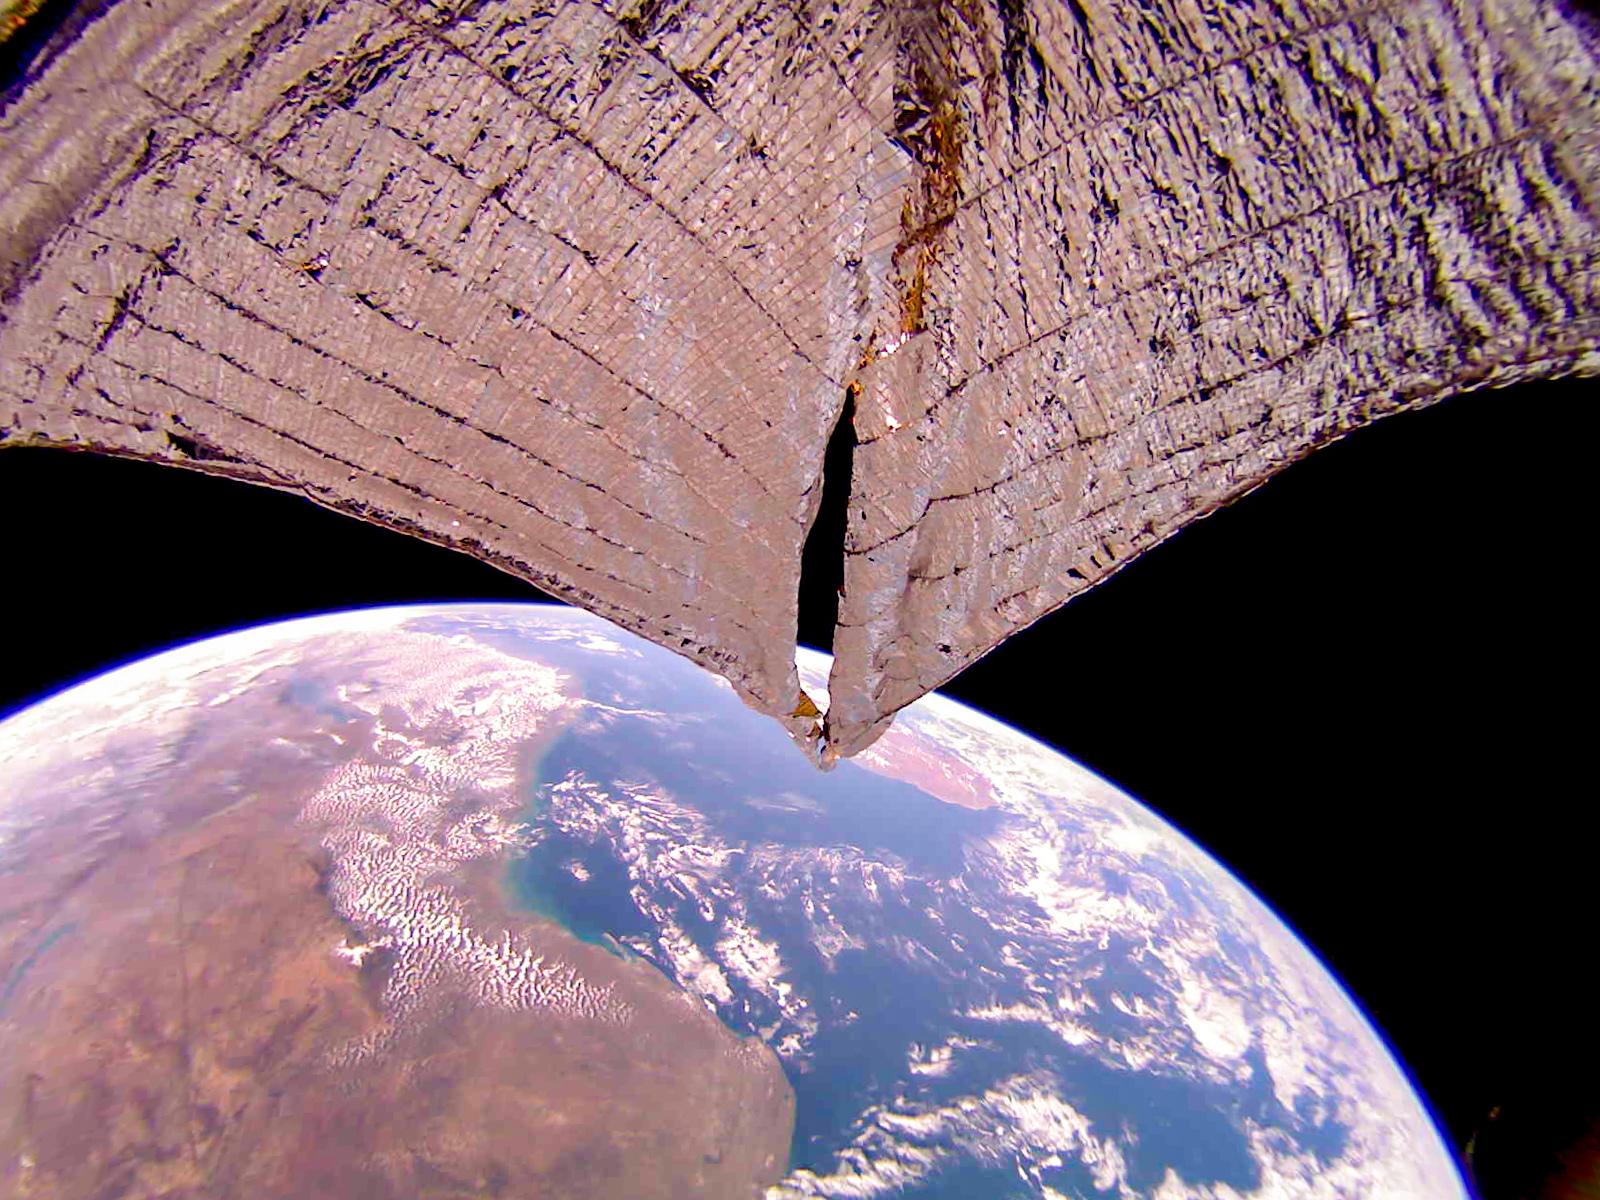 lightsail-2-image-southeast-africa.jpg